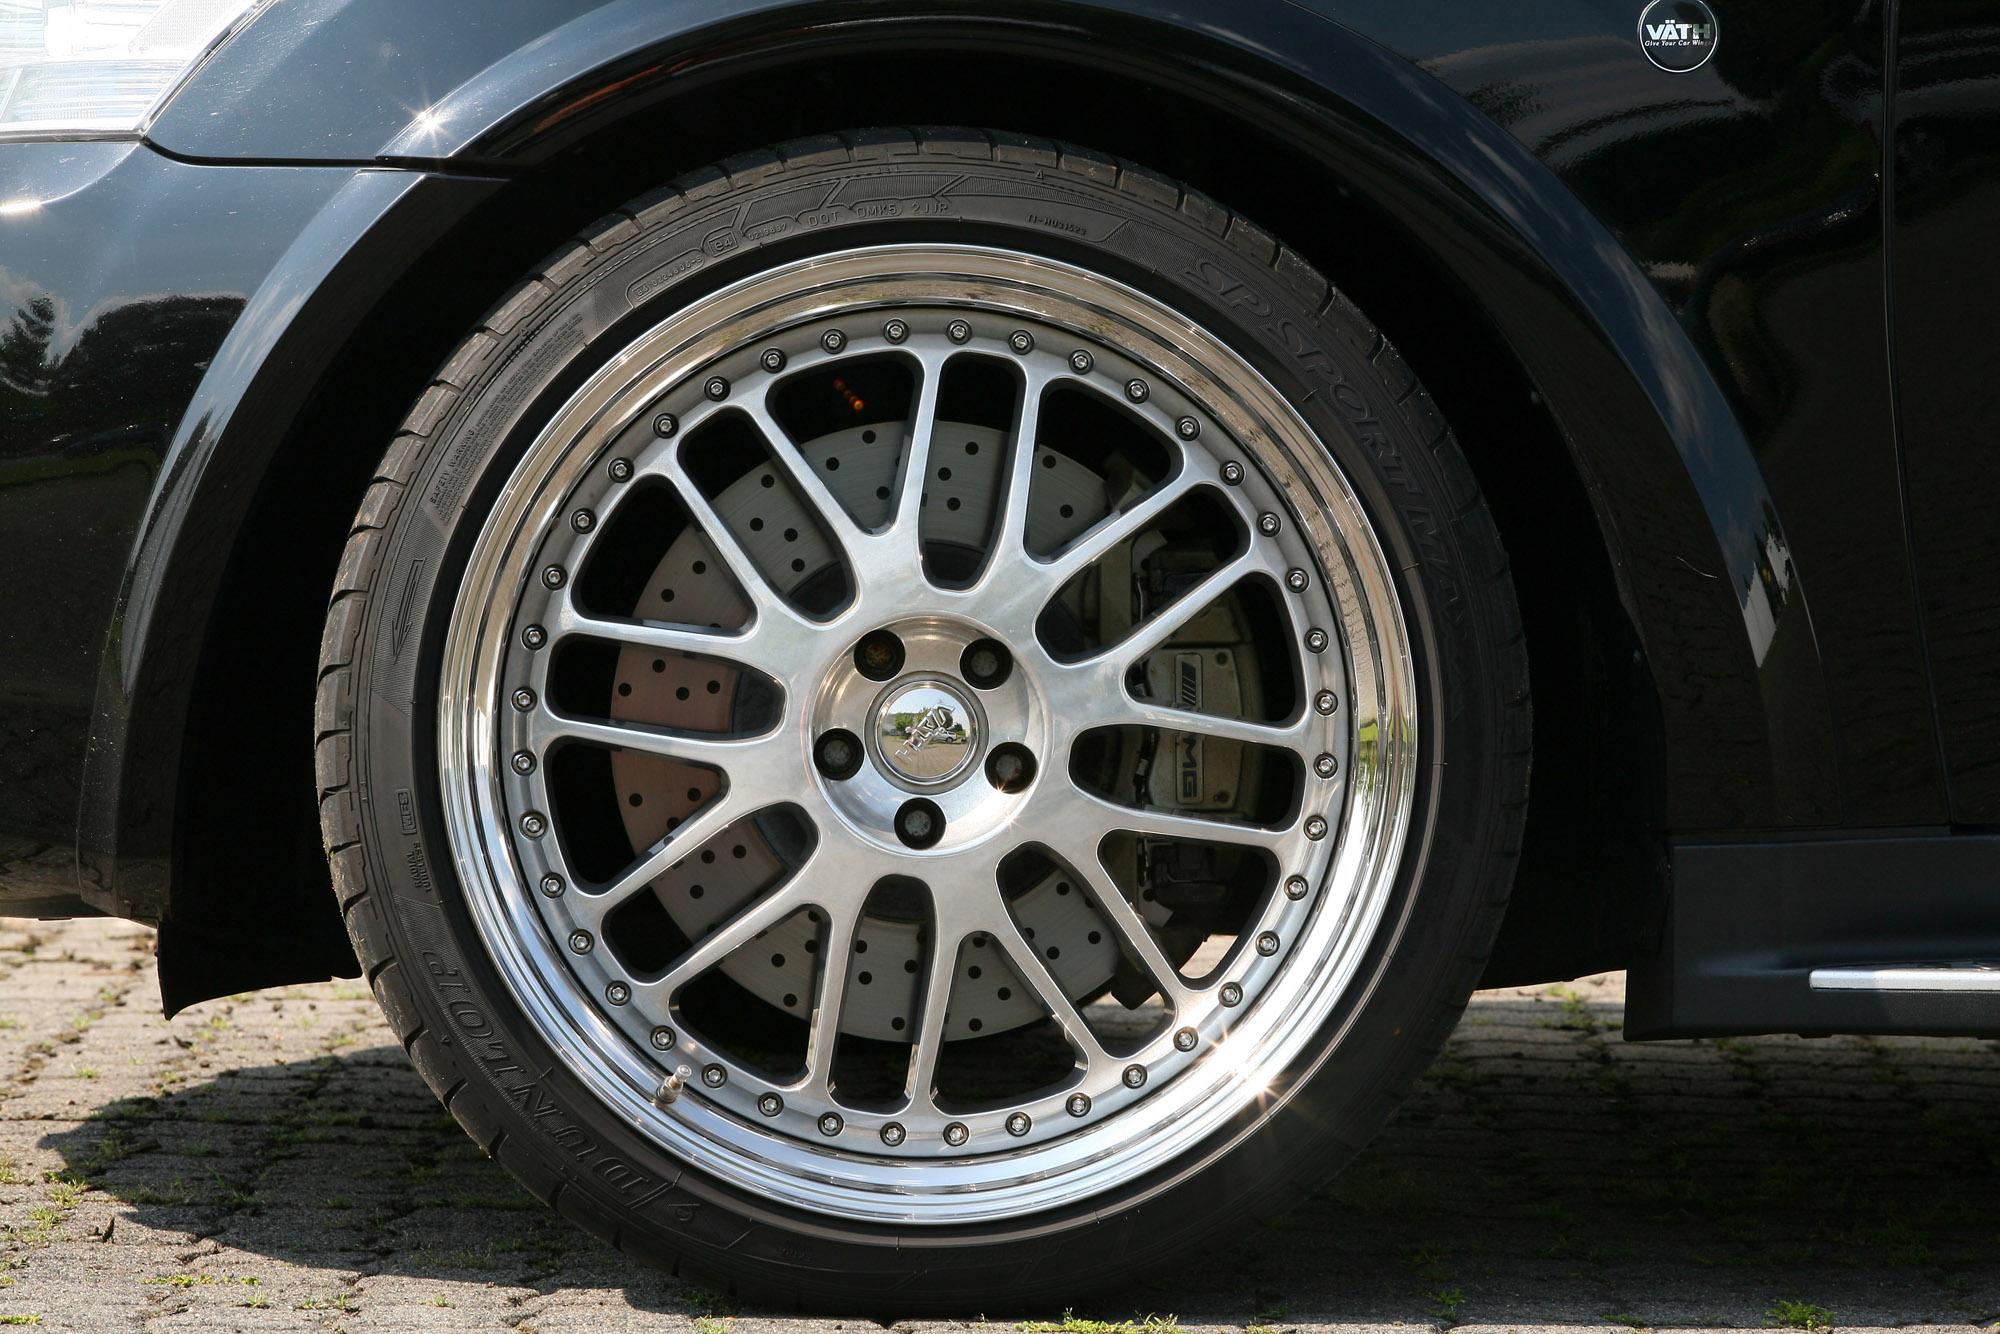 VATH Mercedes-Benz ML63 AMG - фотография №5